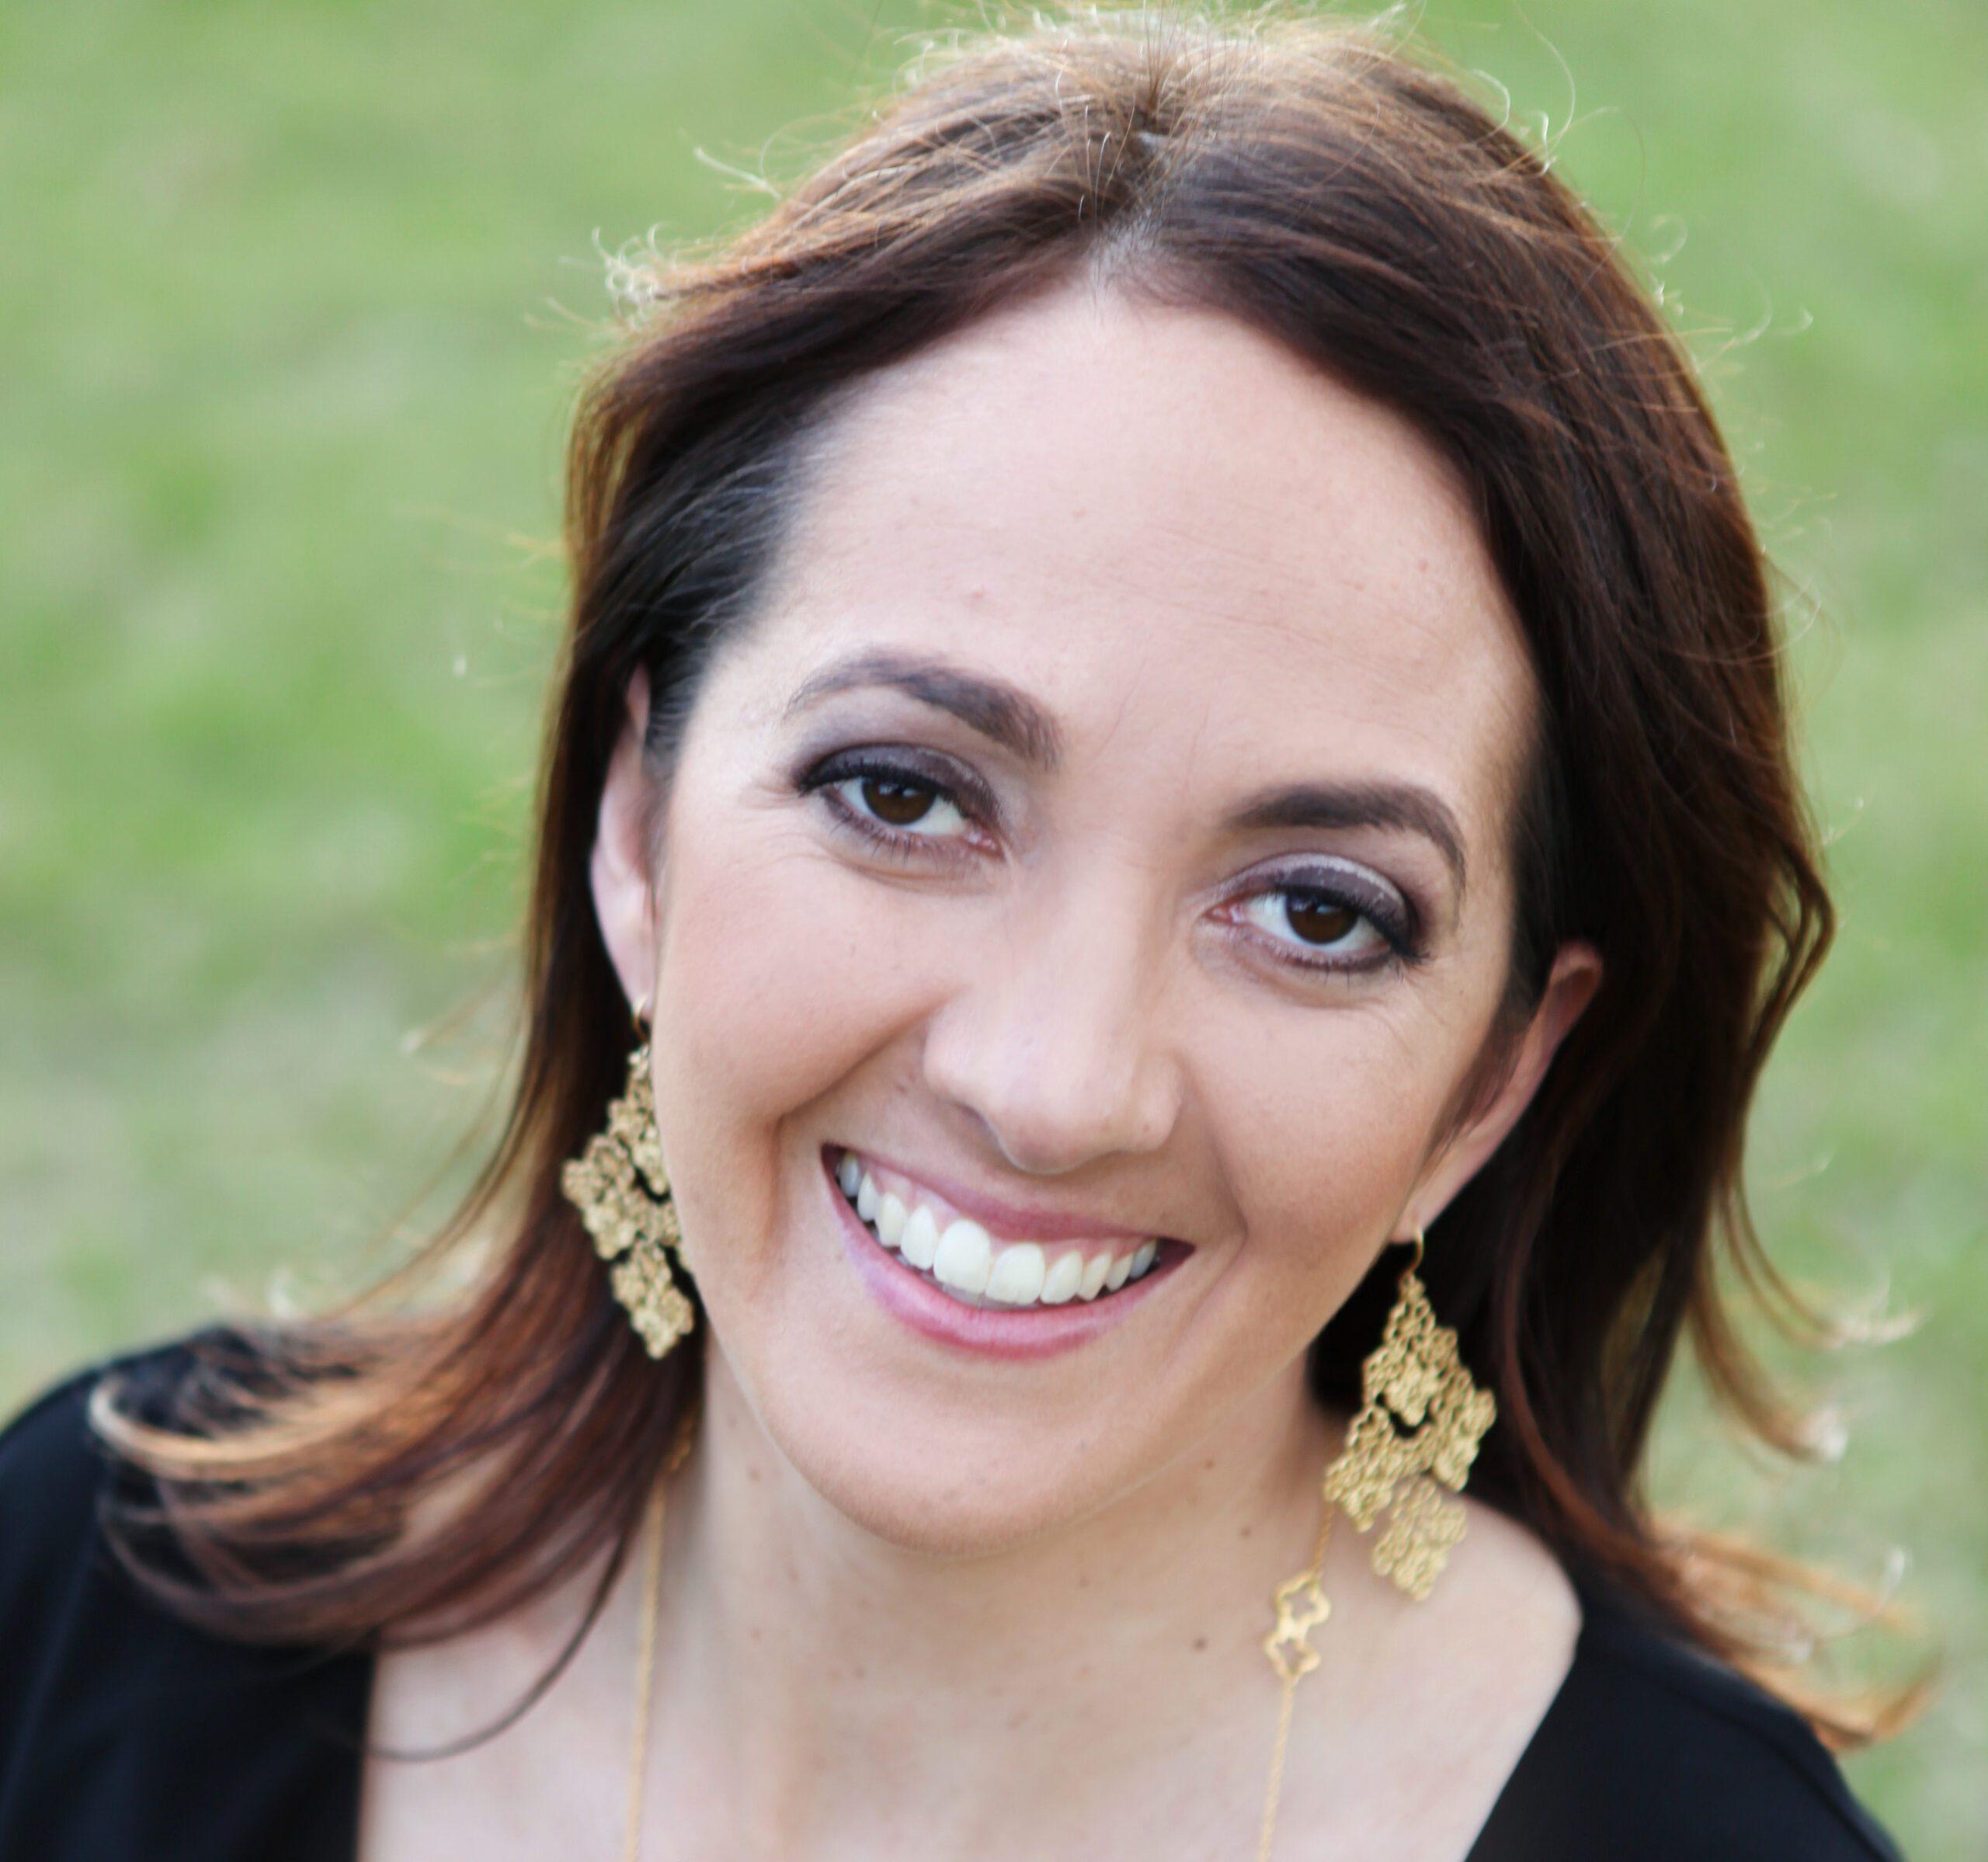 Jen Hemphill - Her Dinero Matters